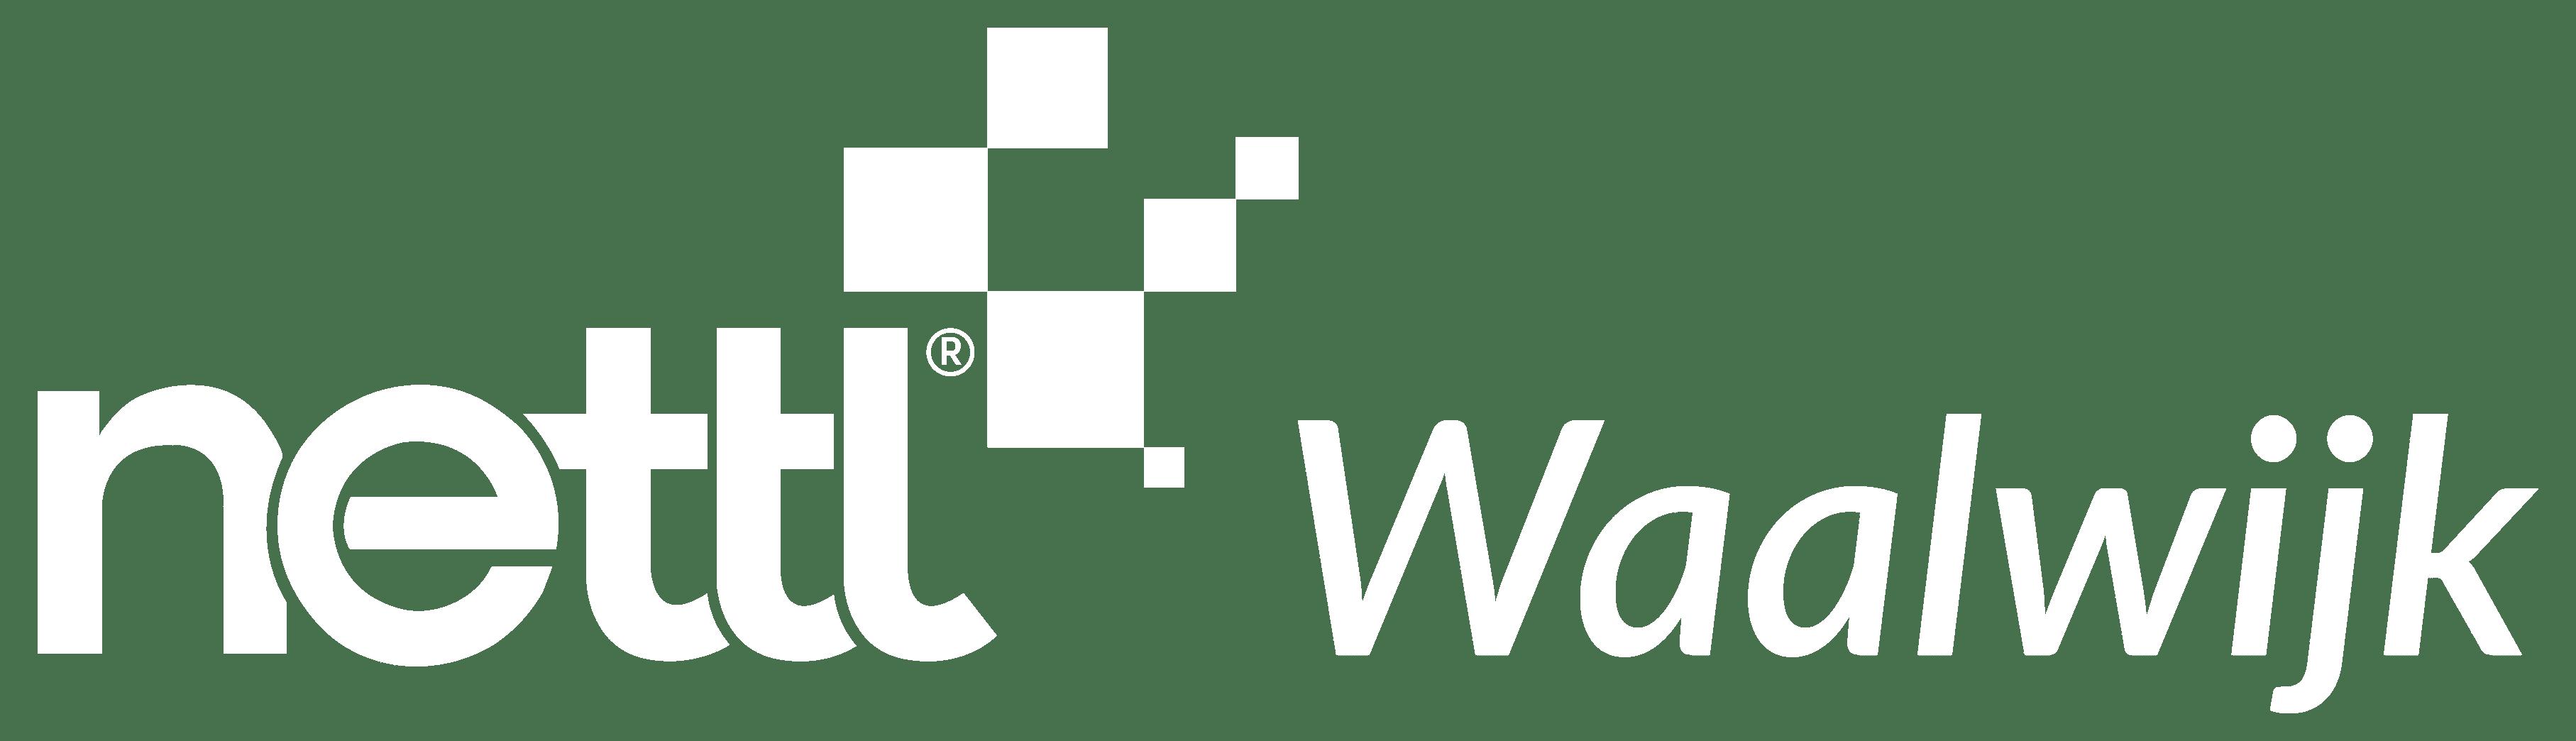 Nettl Waalwijk